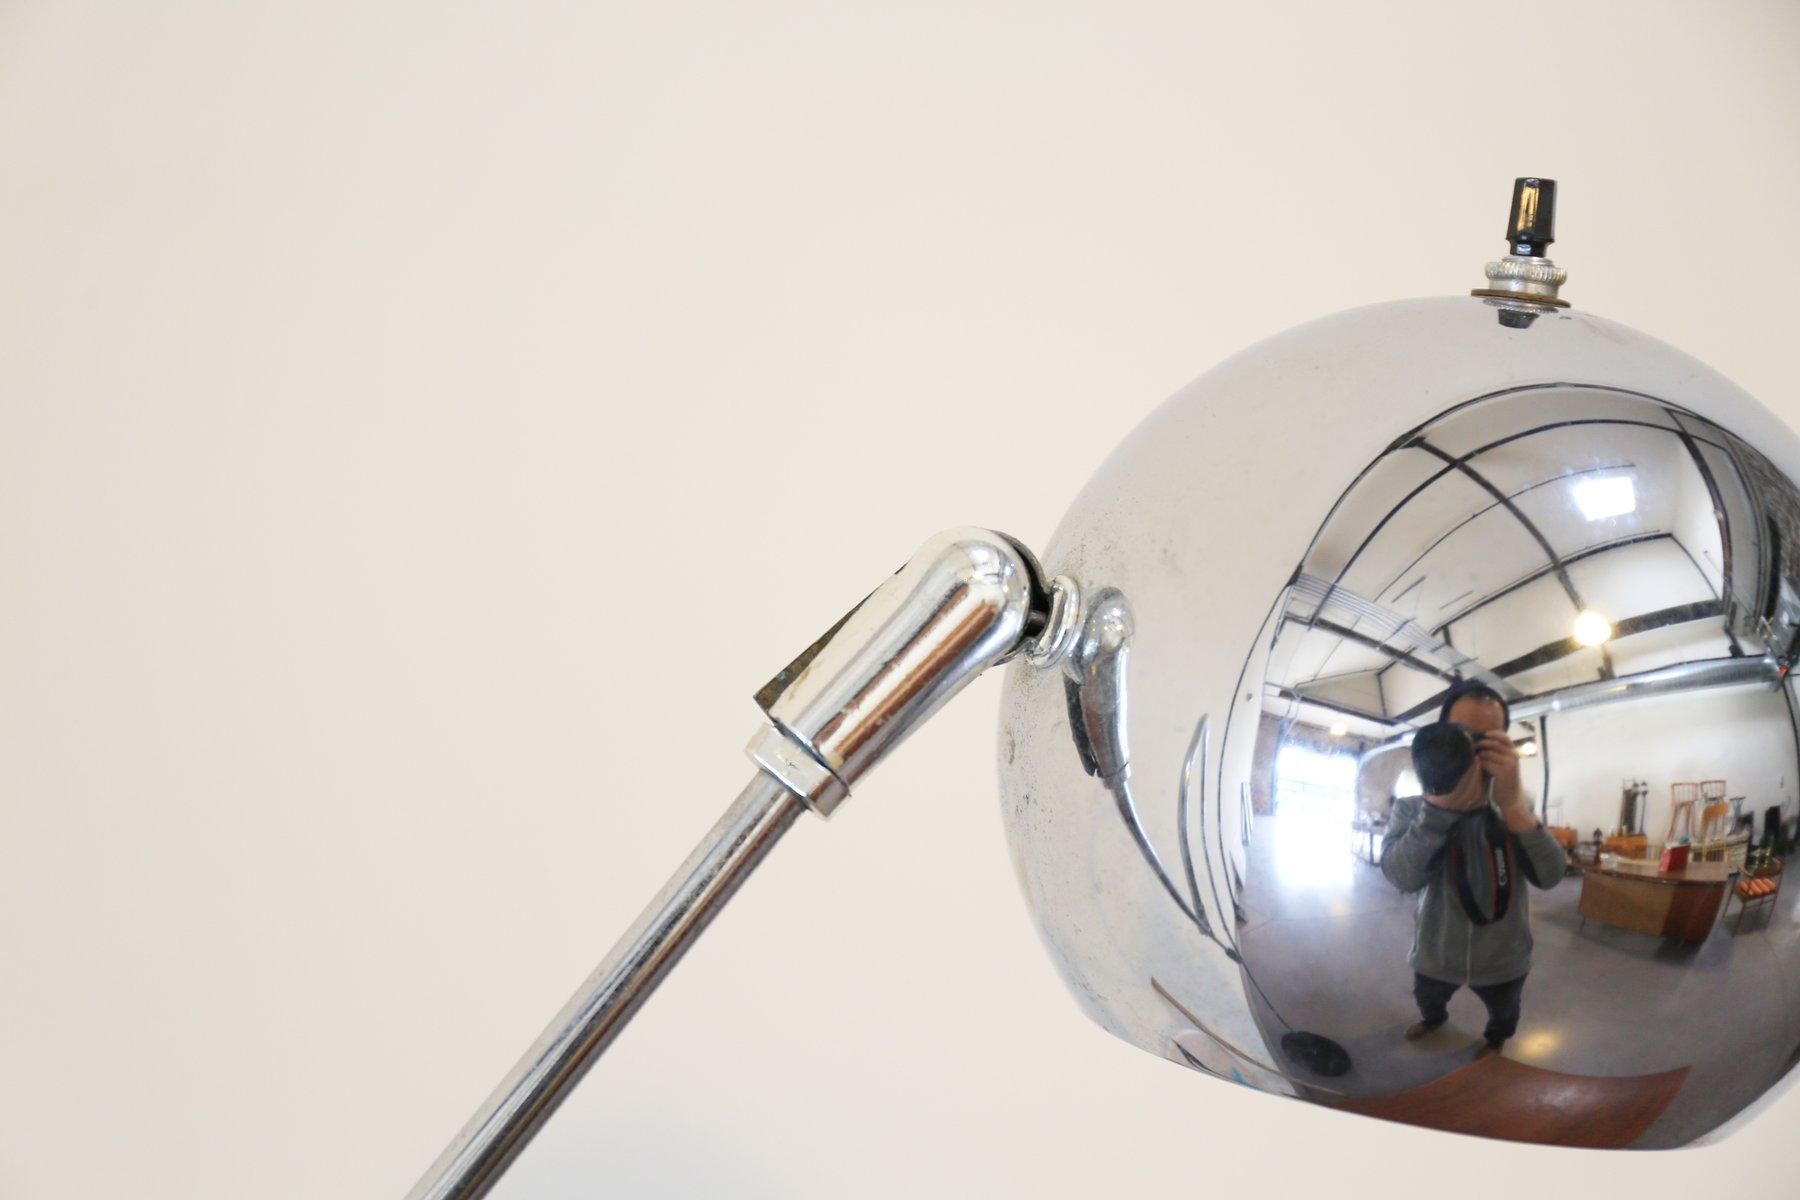 Vintage Orbiter Floor Lamp by Robert Sonneman for sale at Pamono